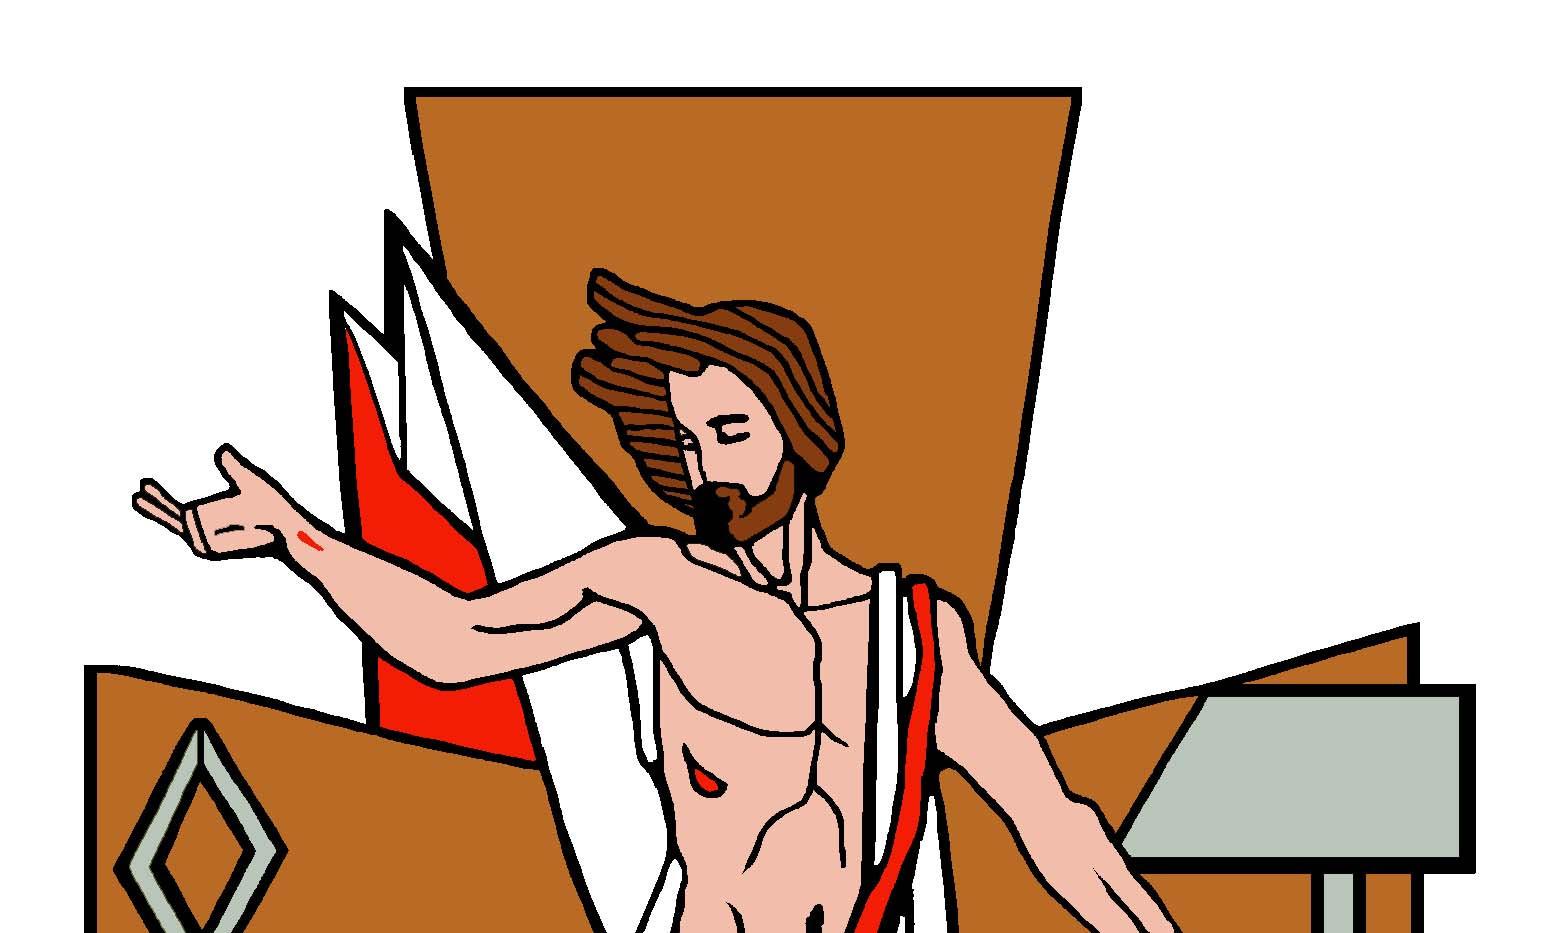 La Salette Risen Christ